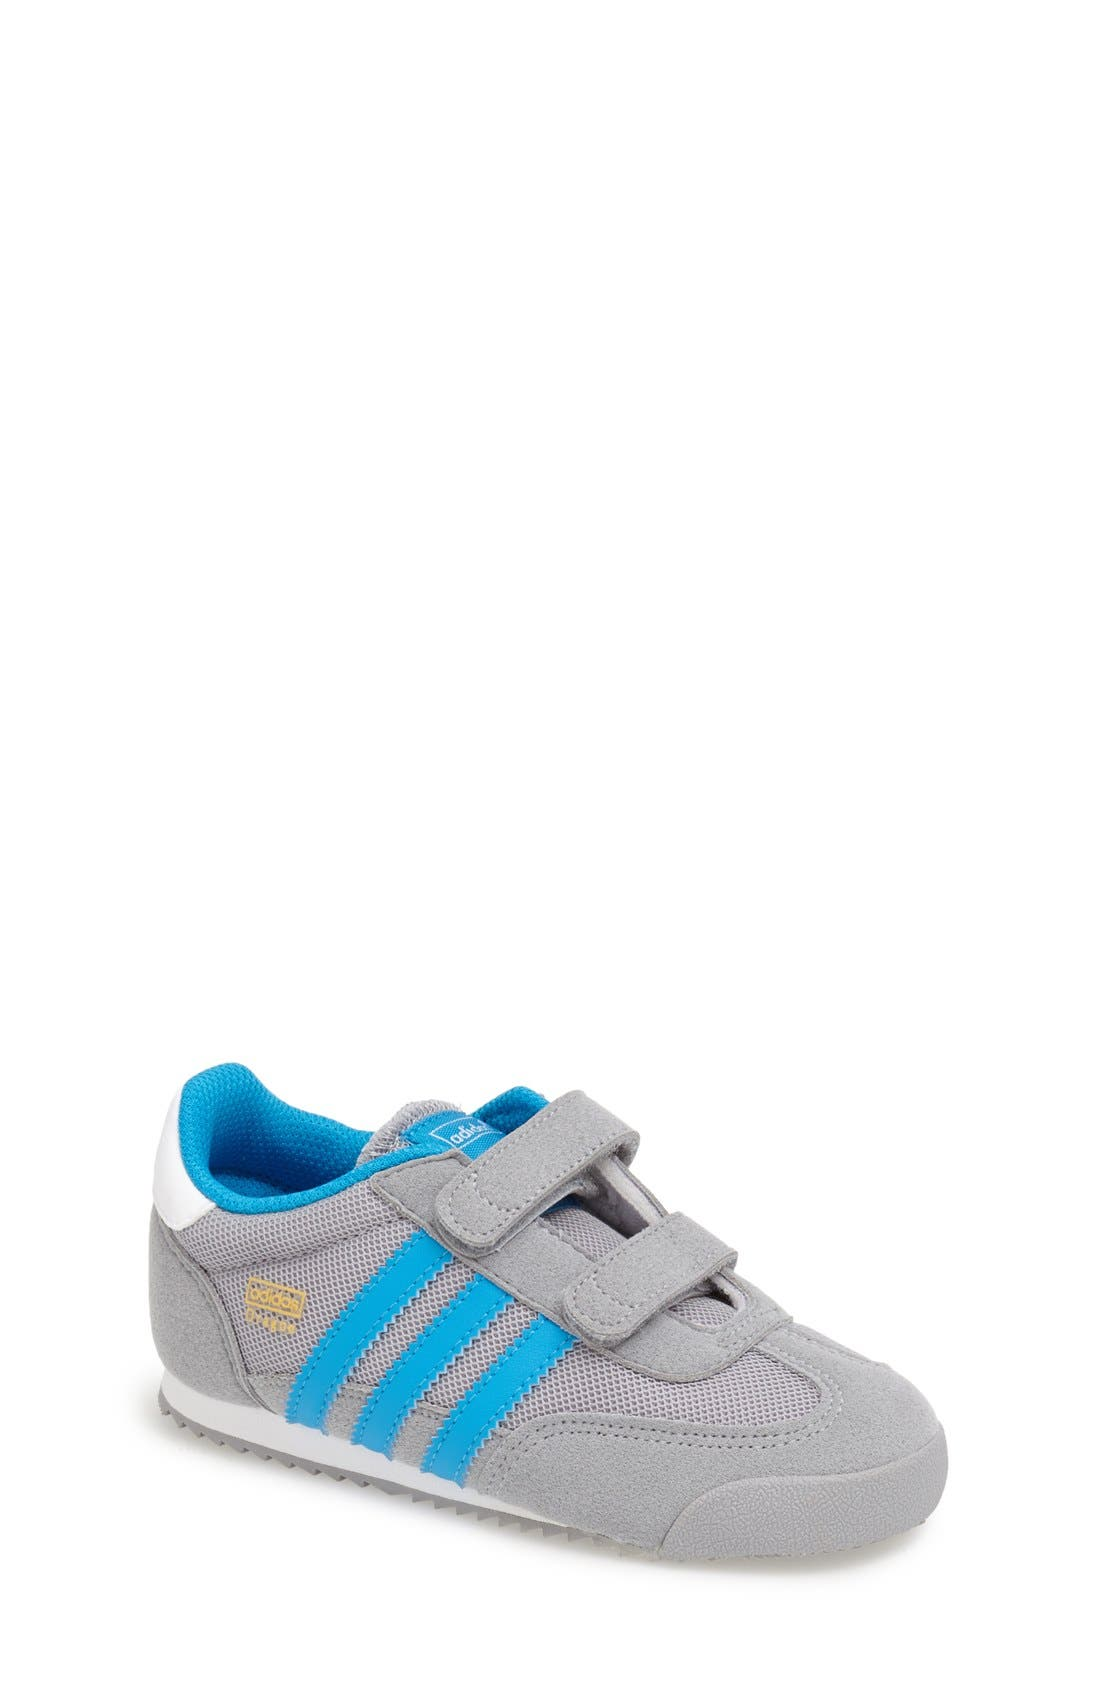 Alternate Image 1 Selected - adidas 'Dragon' Sneaker (Baby, Walker & Toddler)